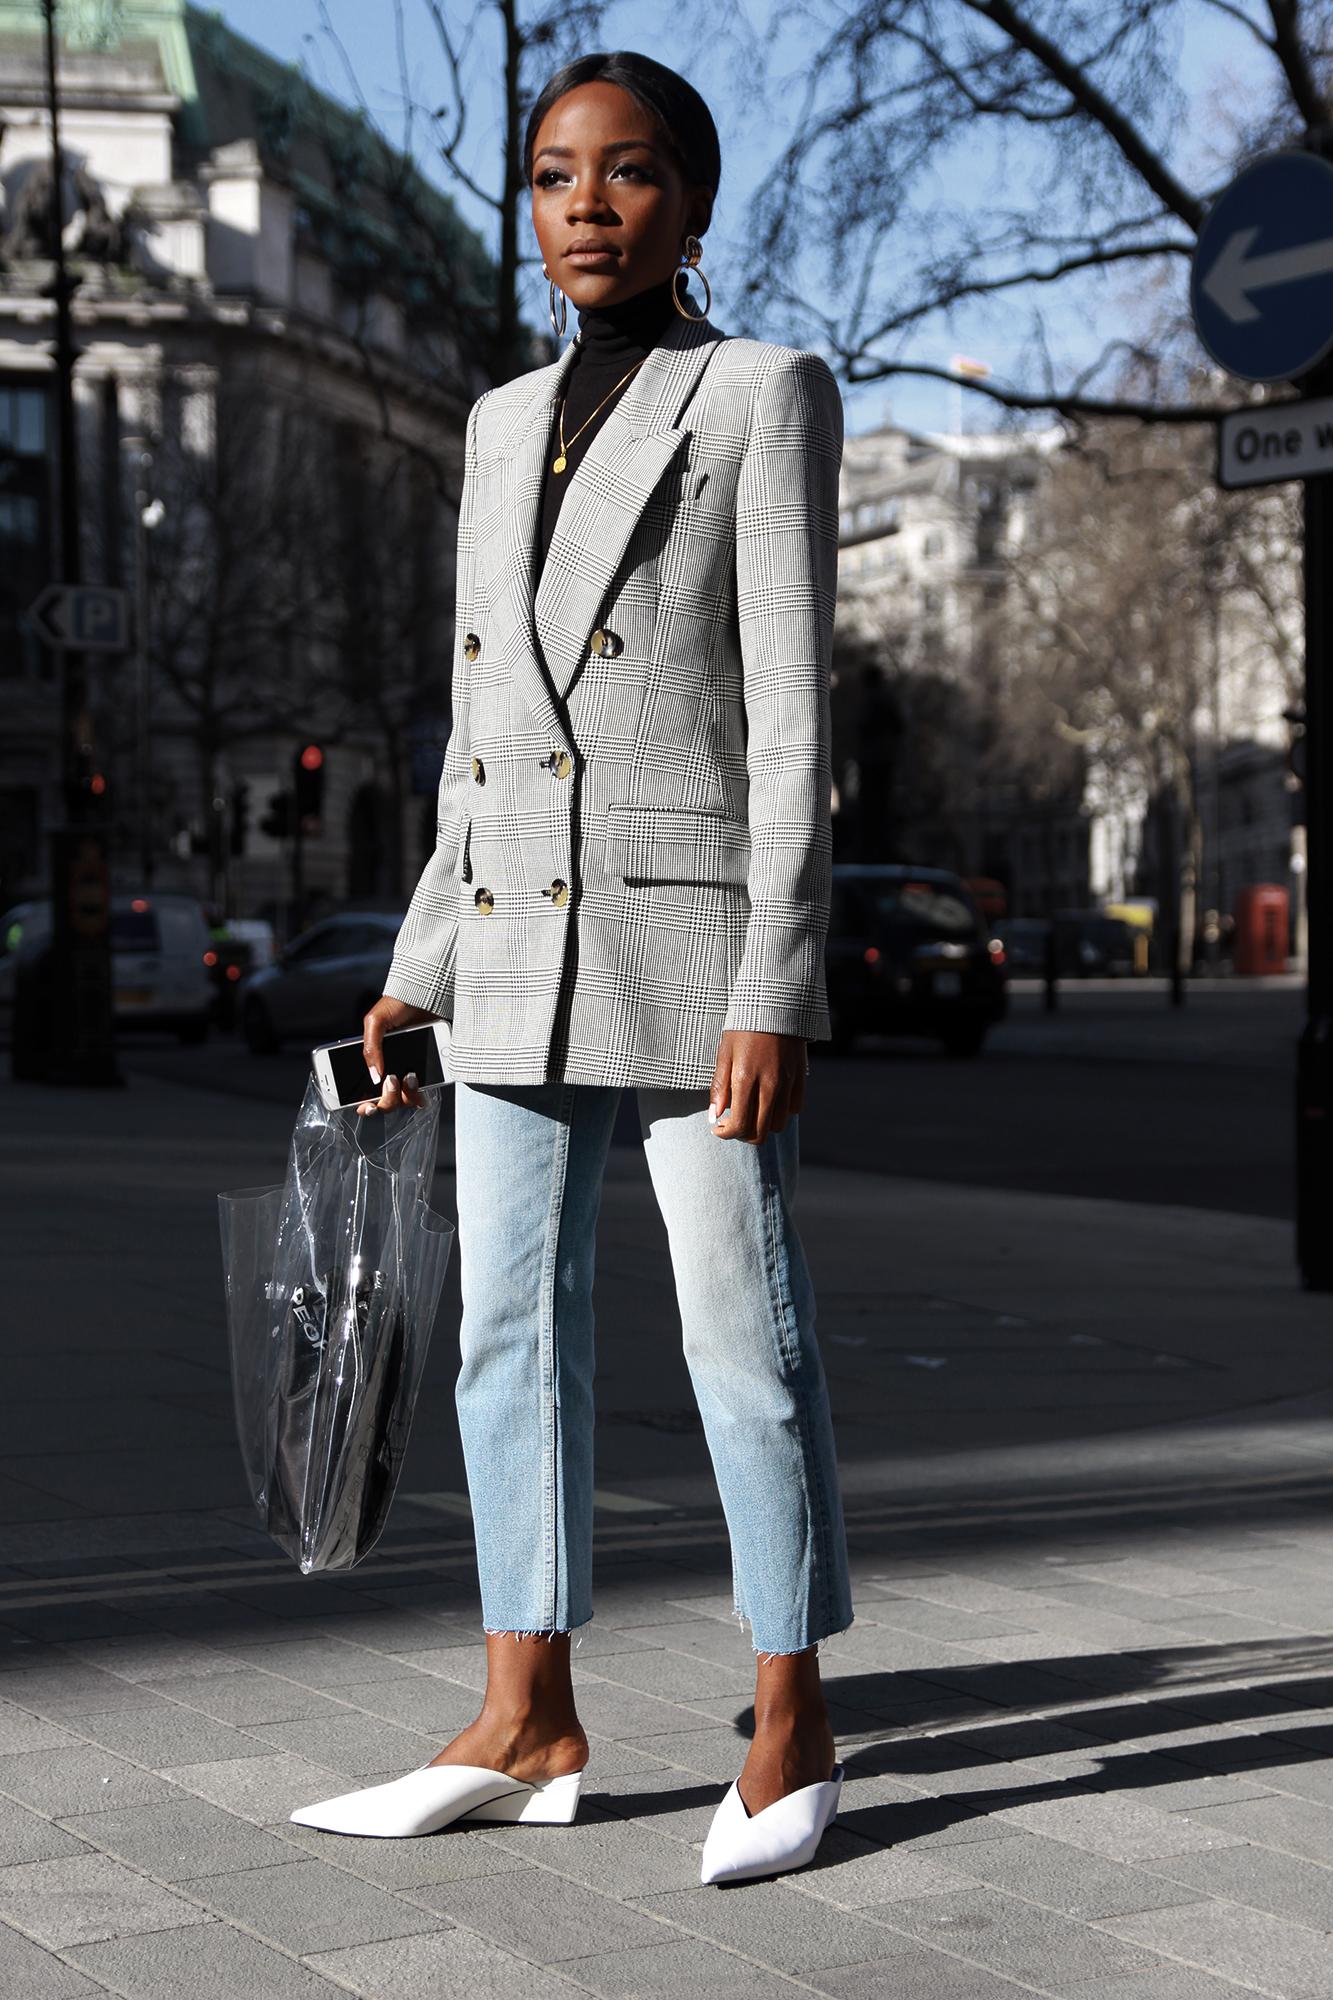 london-fashion-week-day-1-18